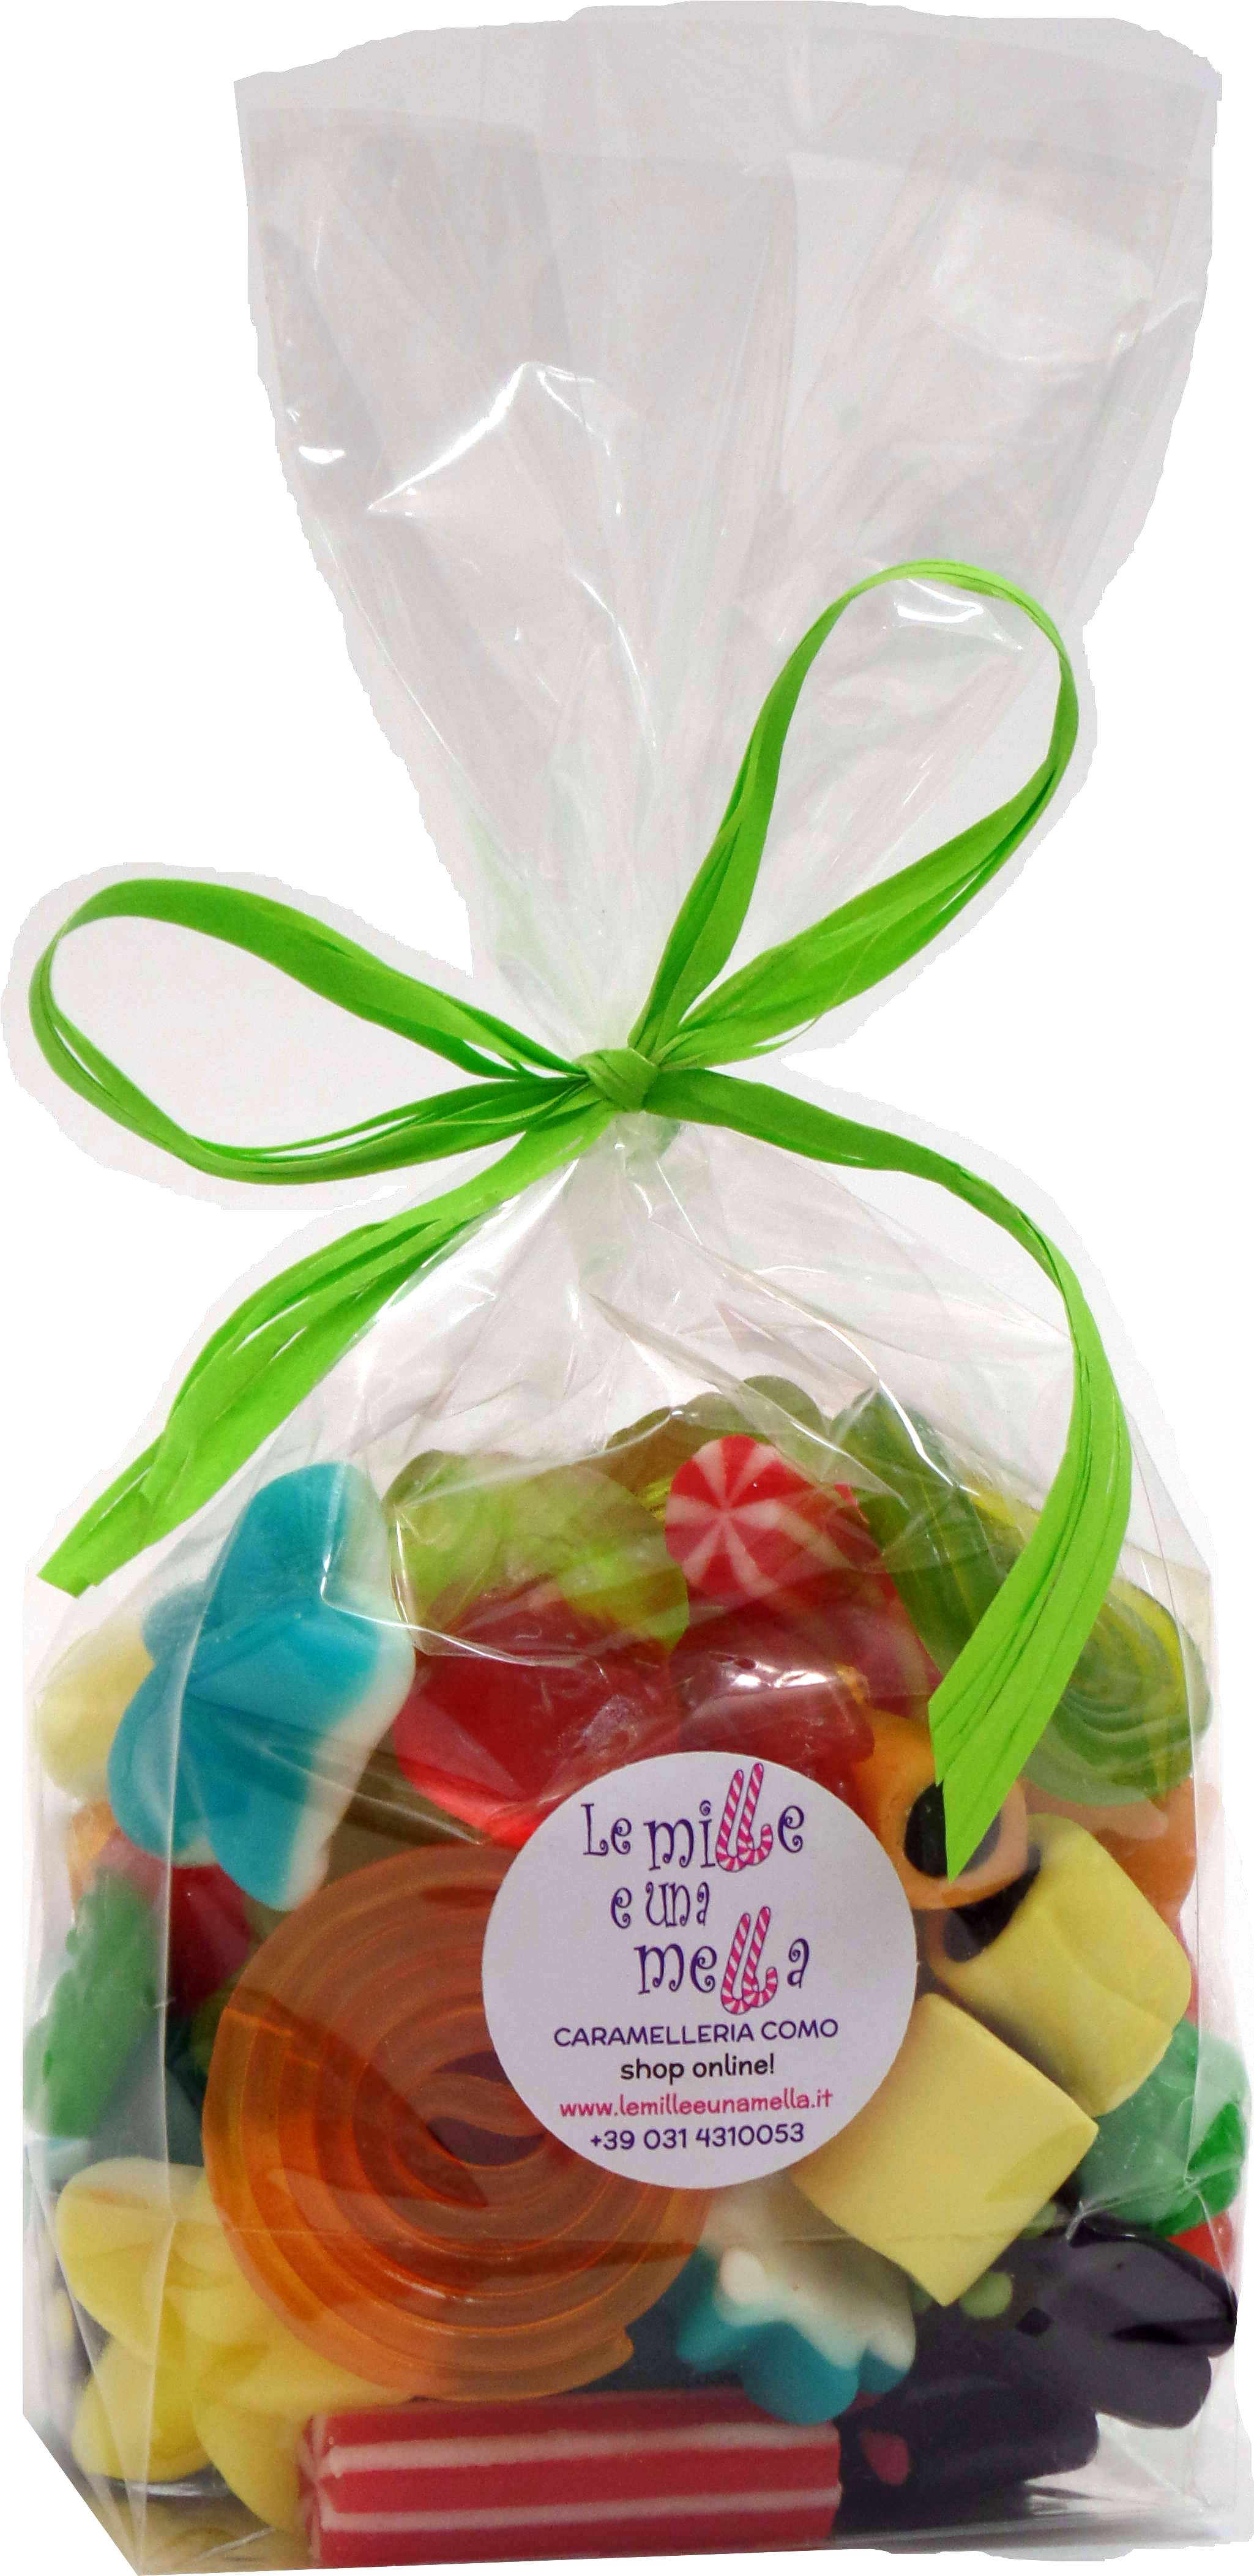 sacchetto caramelle gommose mix vendita online